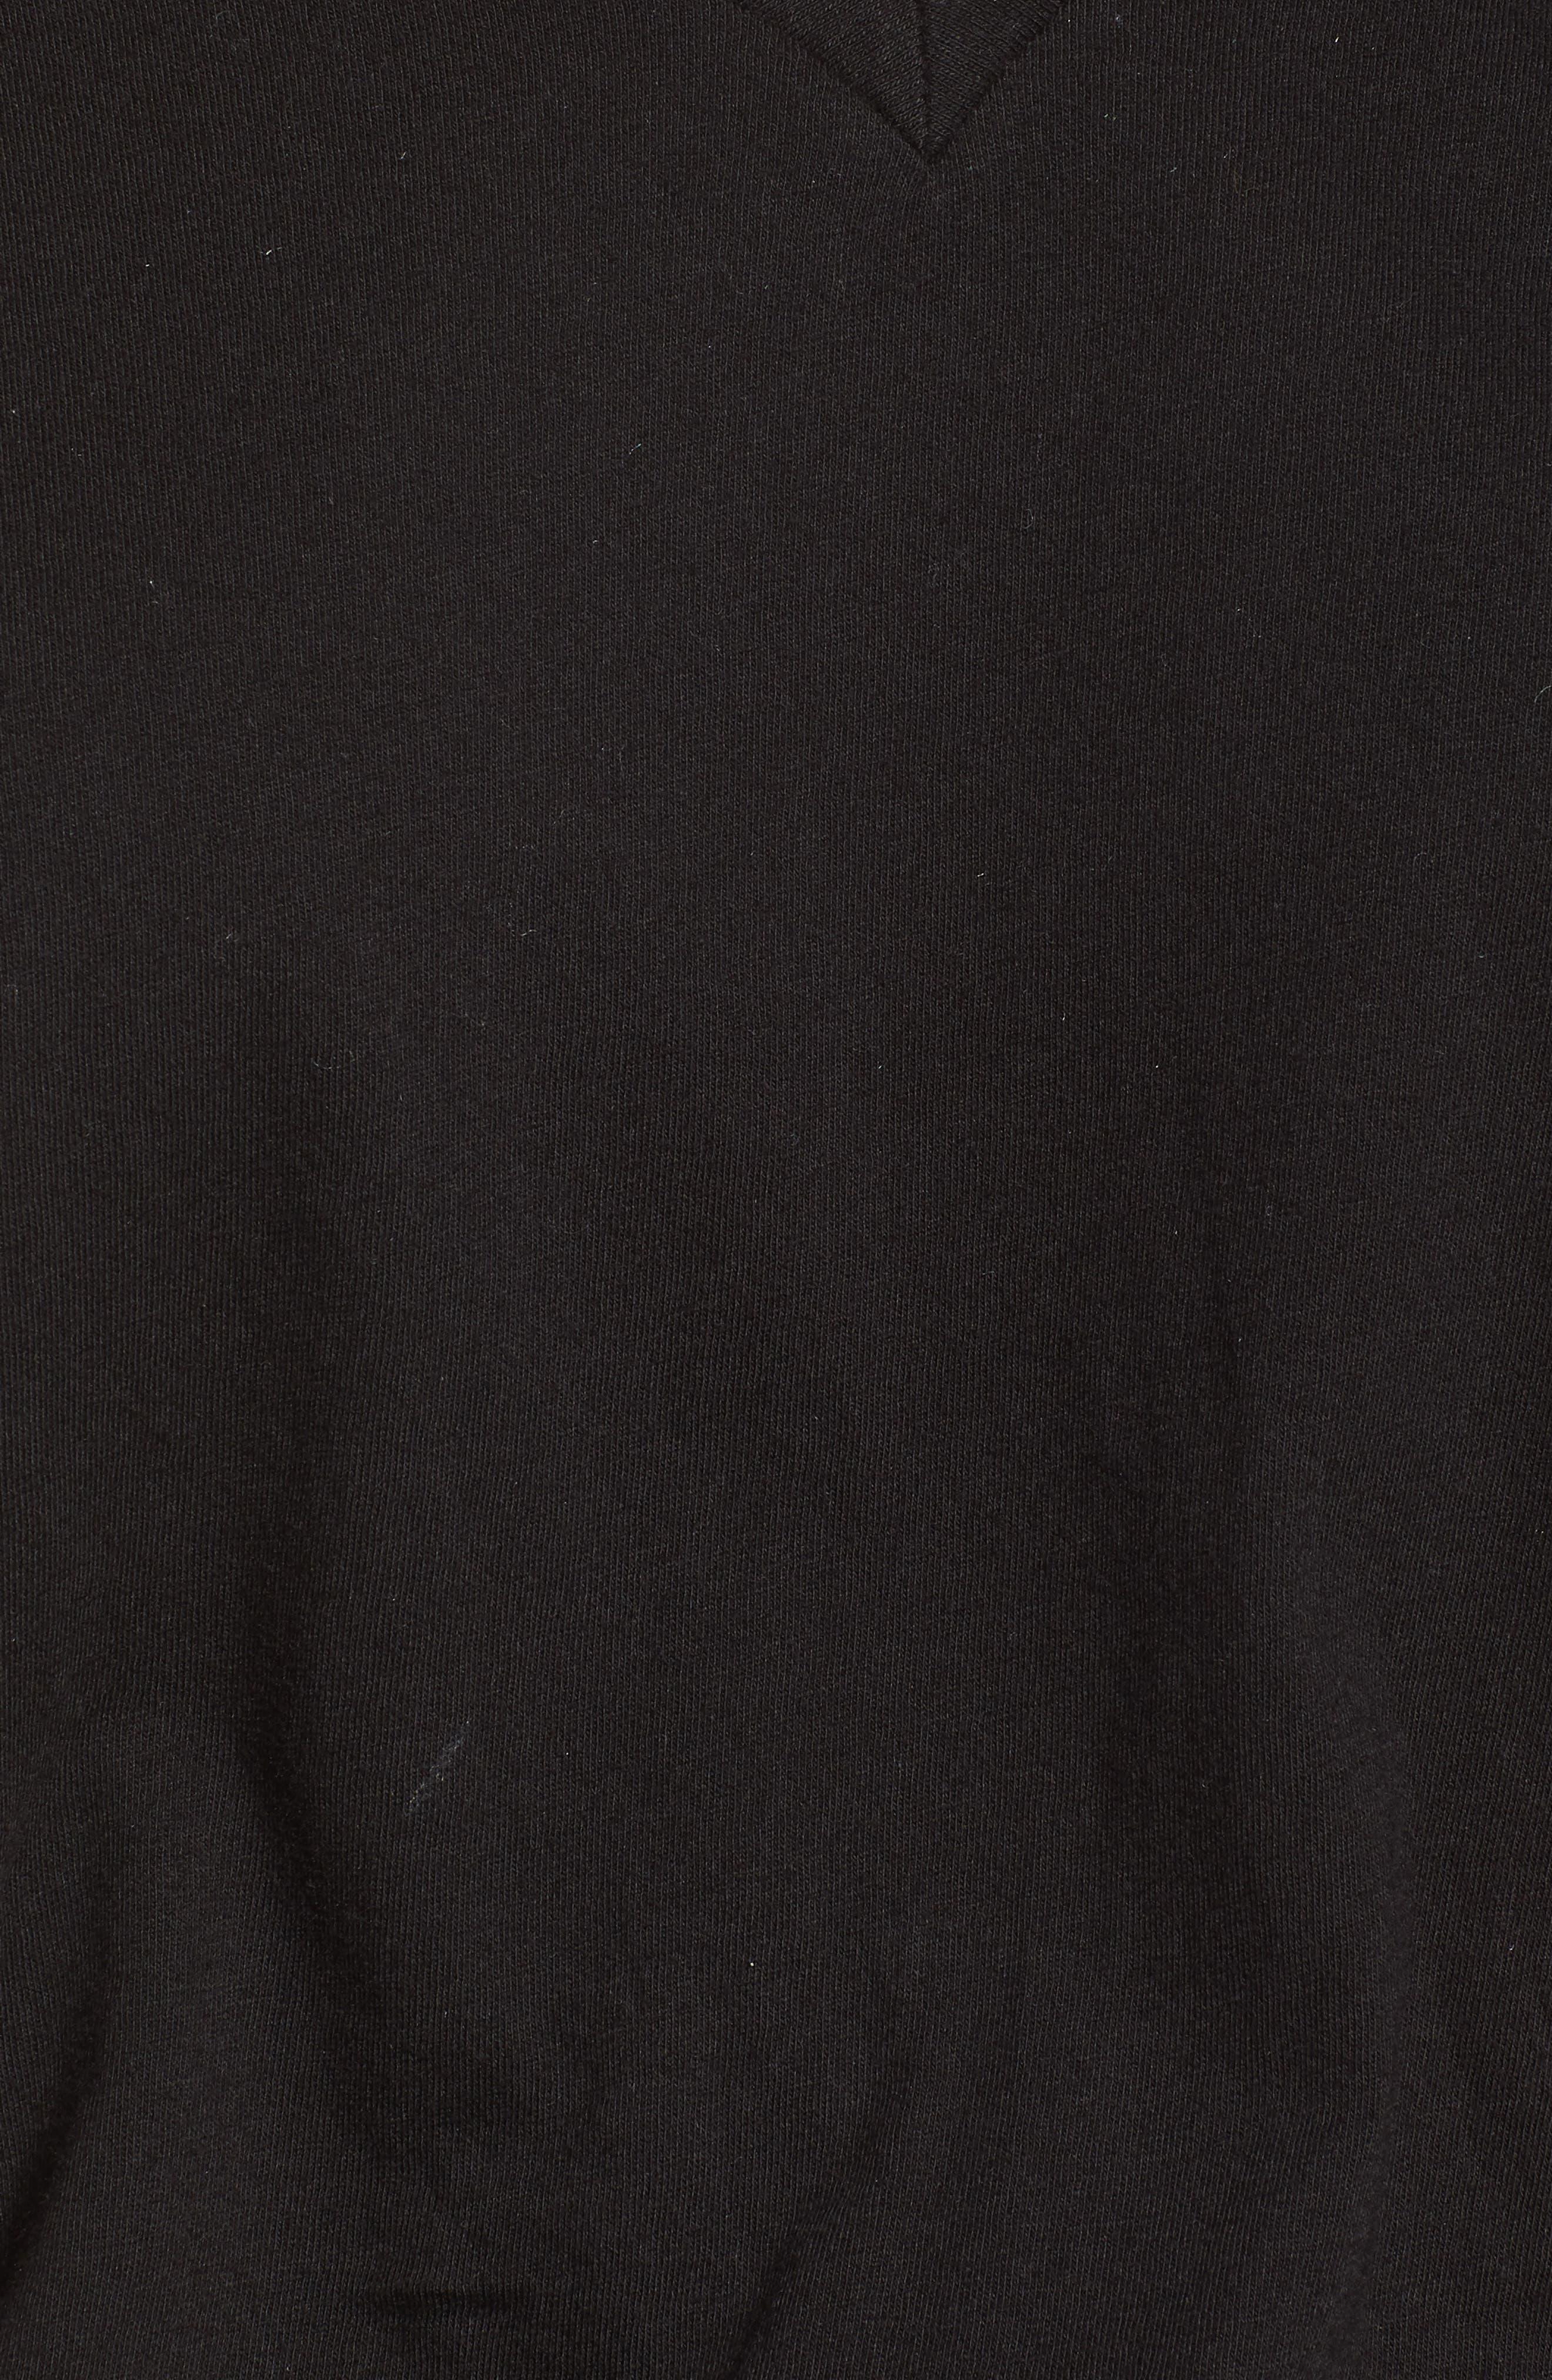 Breeze Cutout Romper,                             Alternate thumbnail 6, color,                             Black Cat